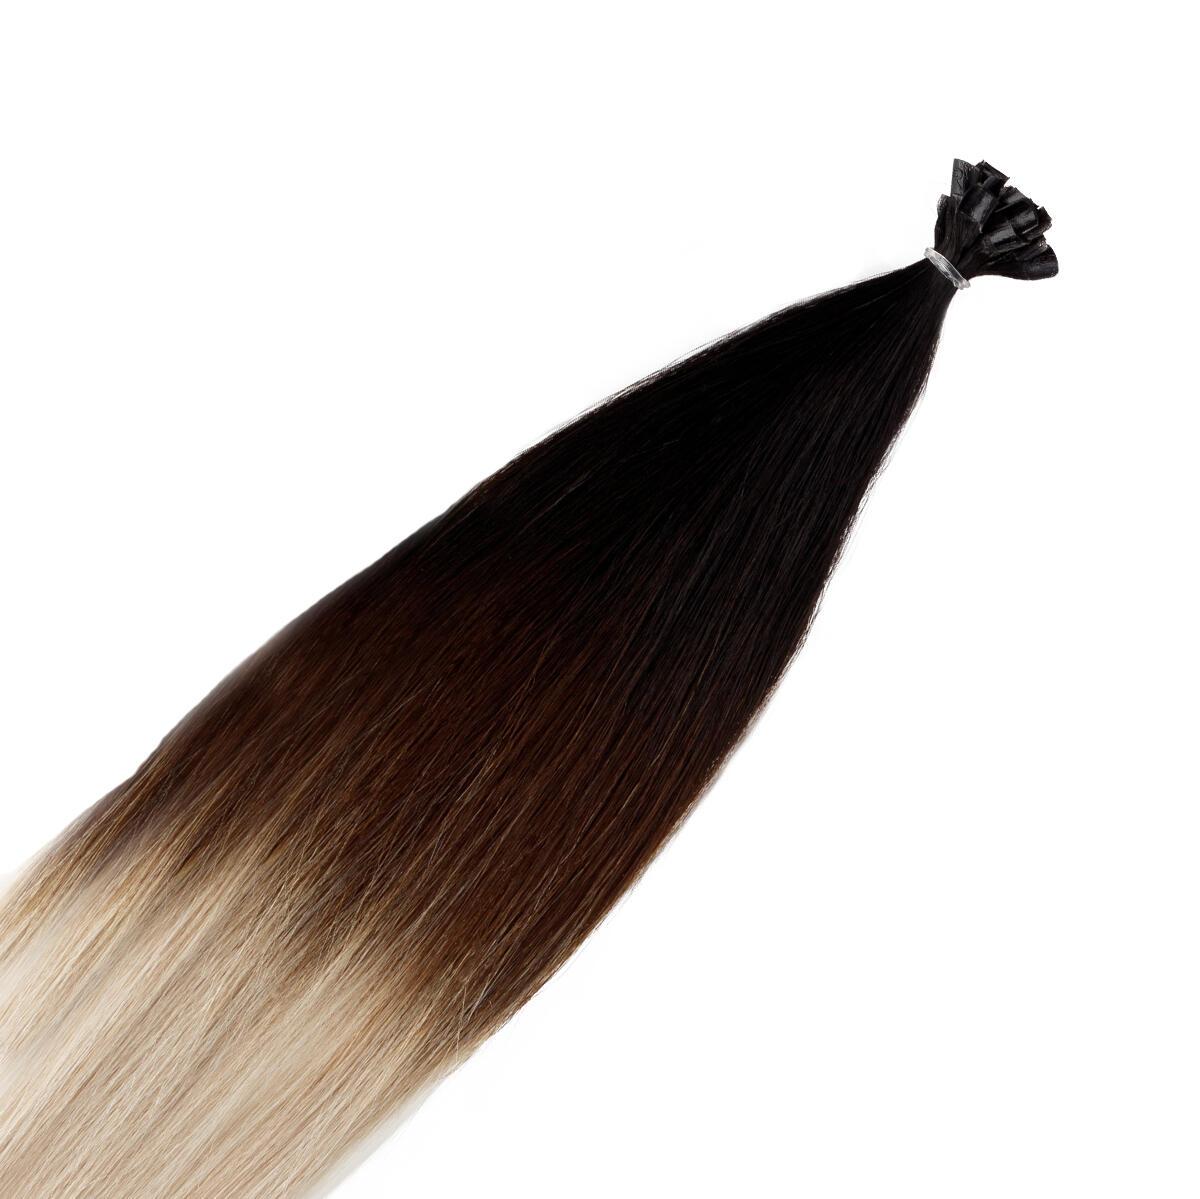 Nail Hair O1.2/99.6 Grey Black Brown Grey Ombre 40 cm